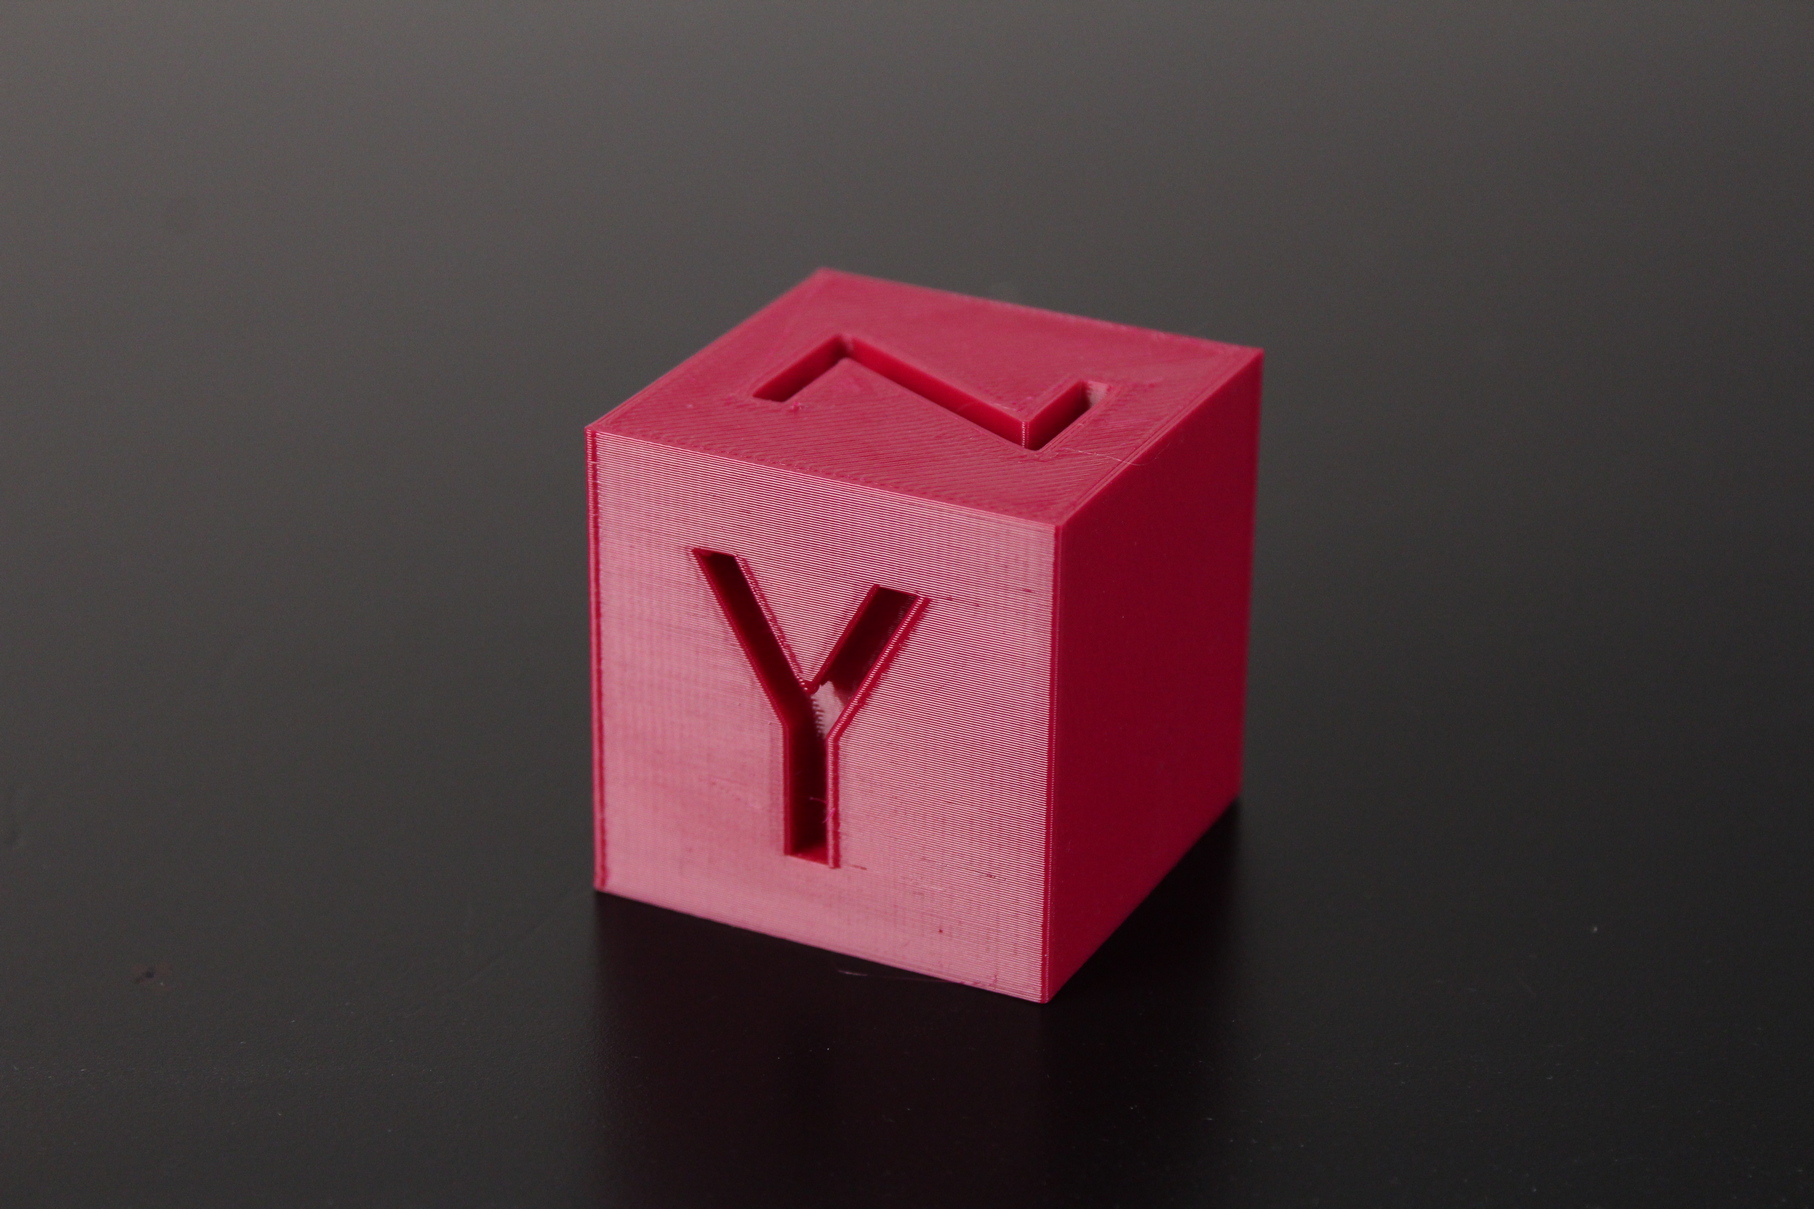 PETG-Calibration-Cube-on-Sermoon-D1-1